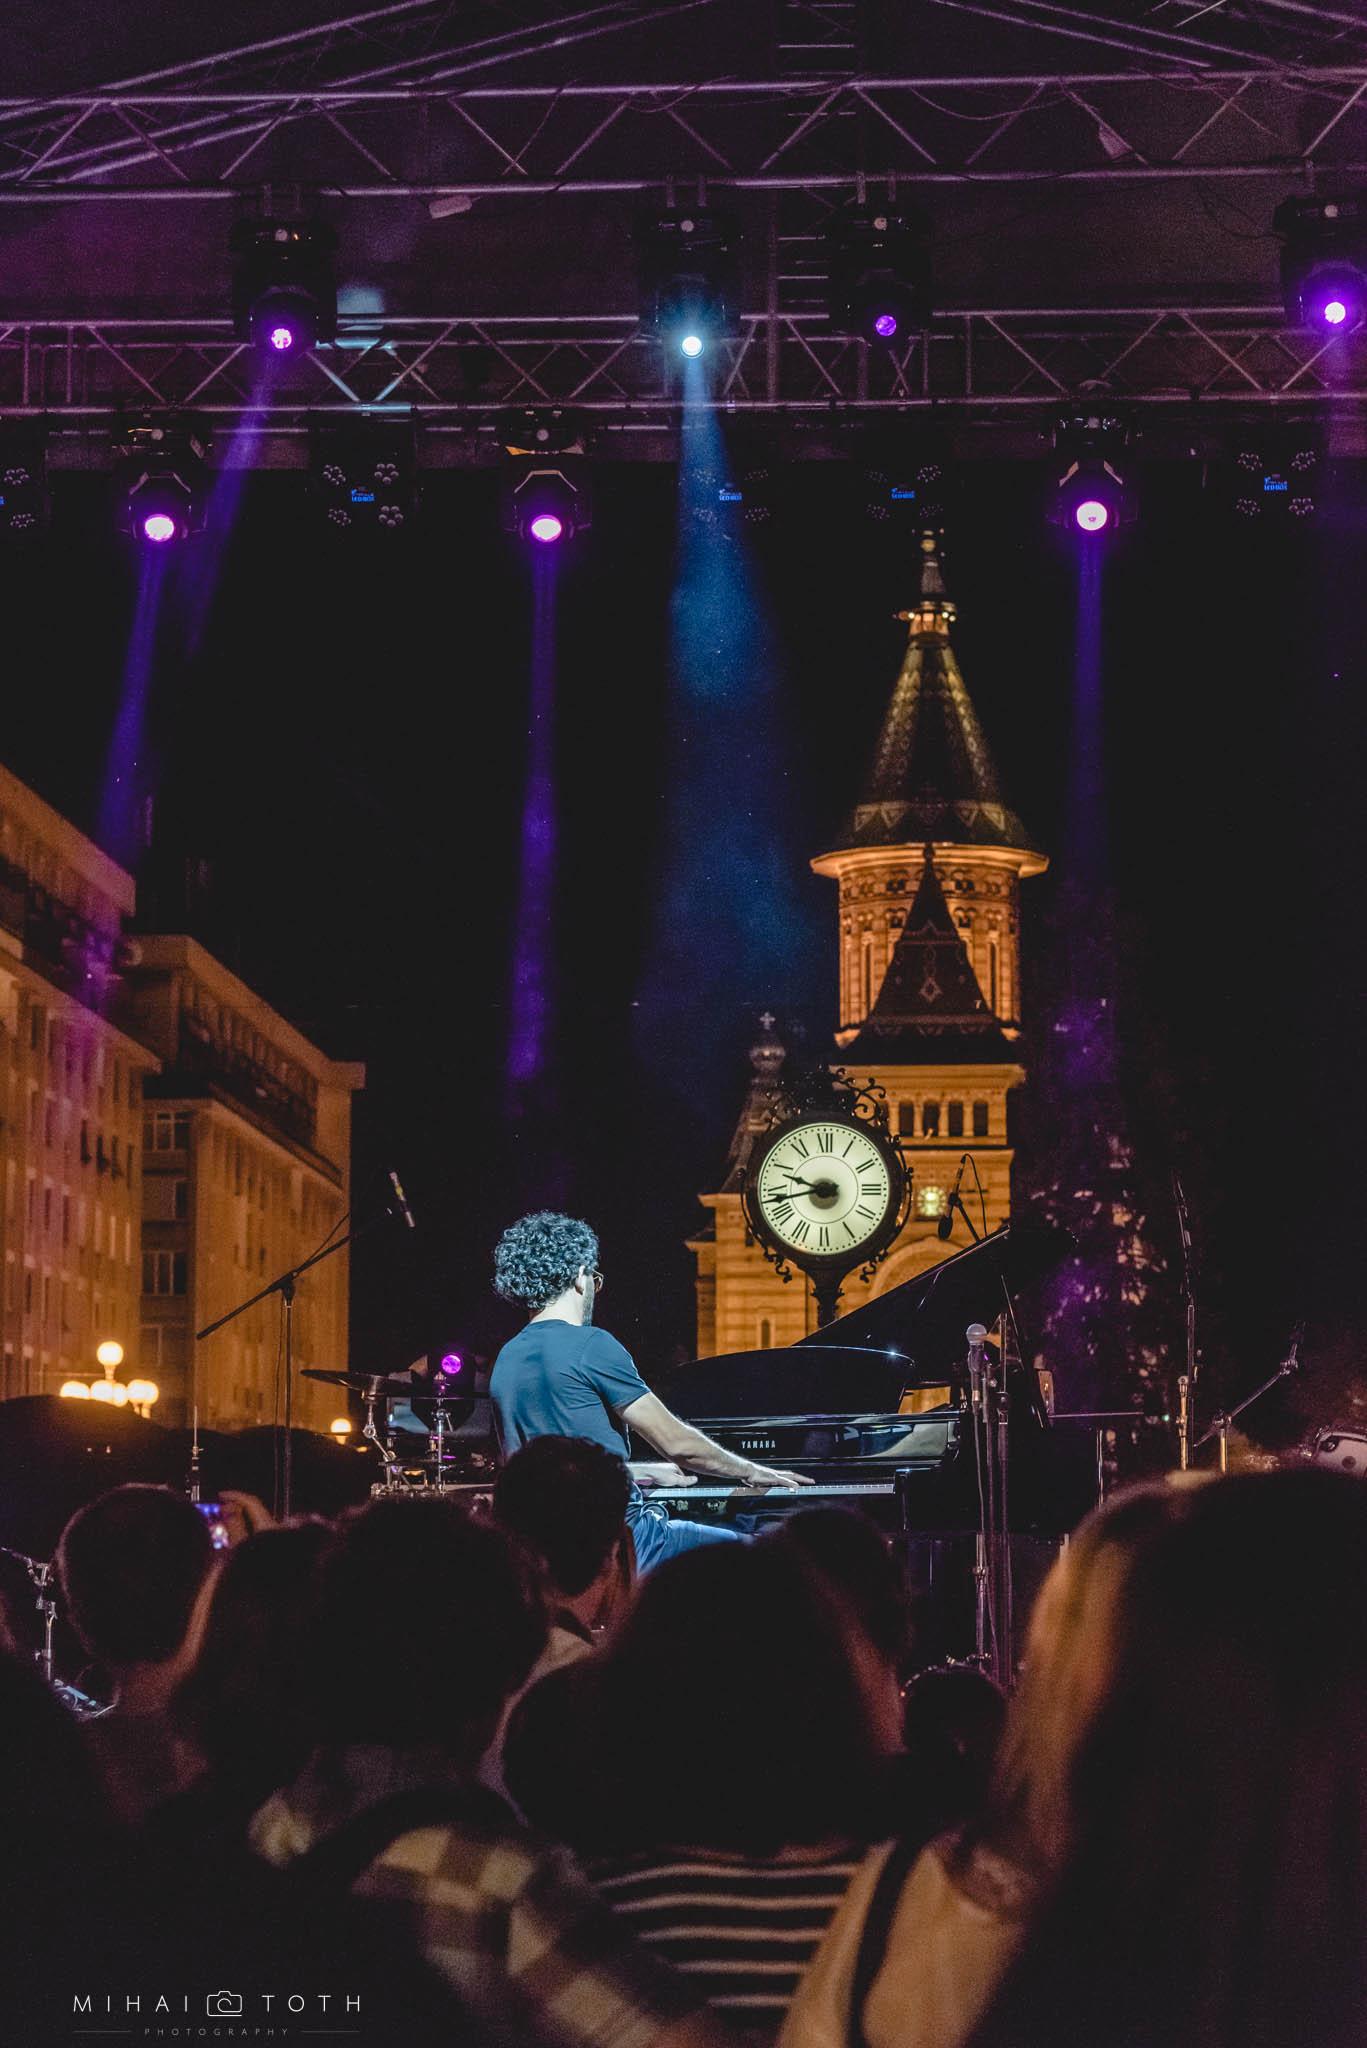 Teo Milea - Live in Timisoara